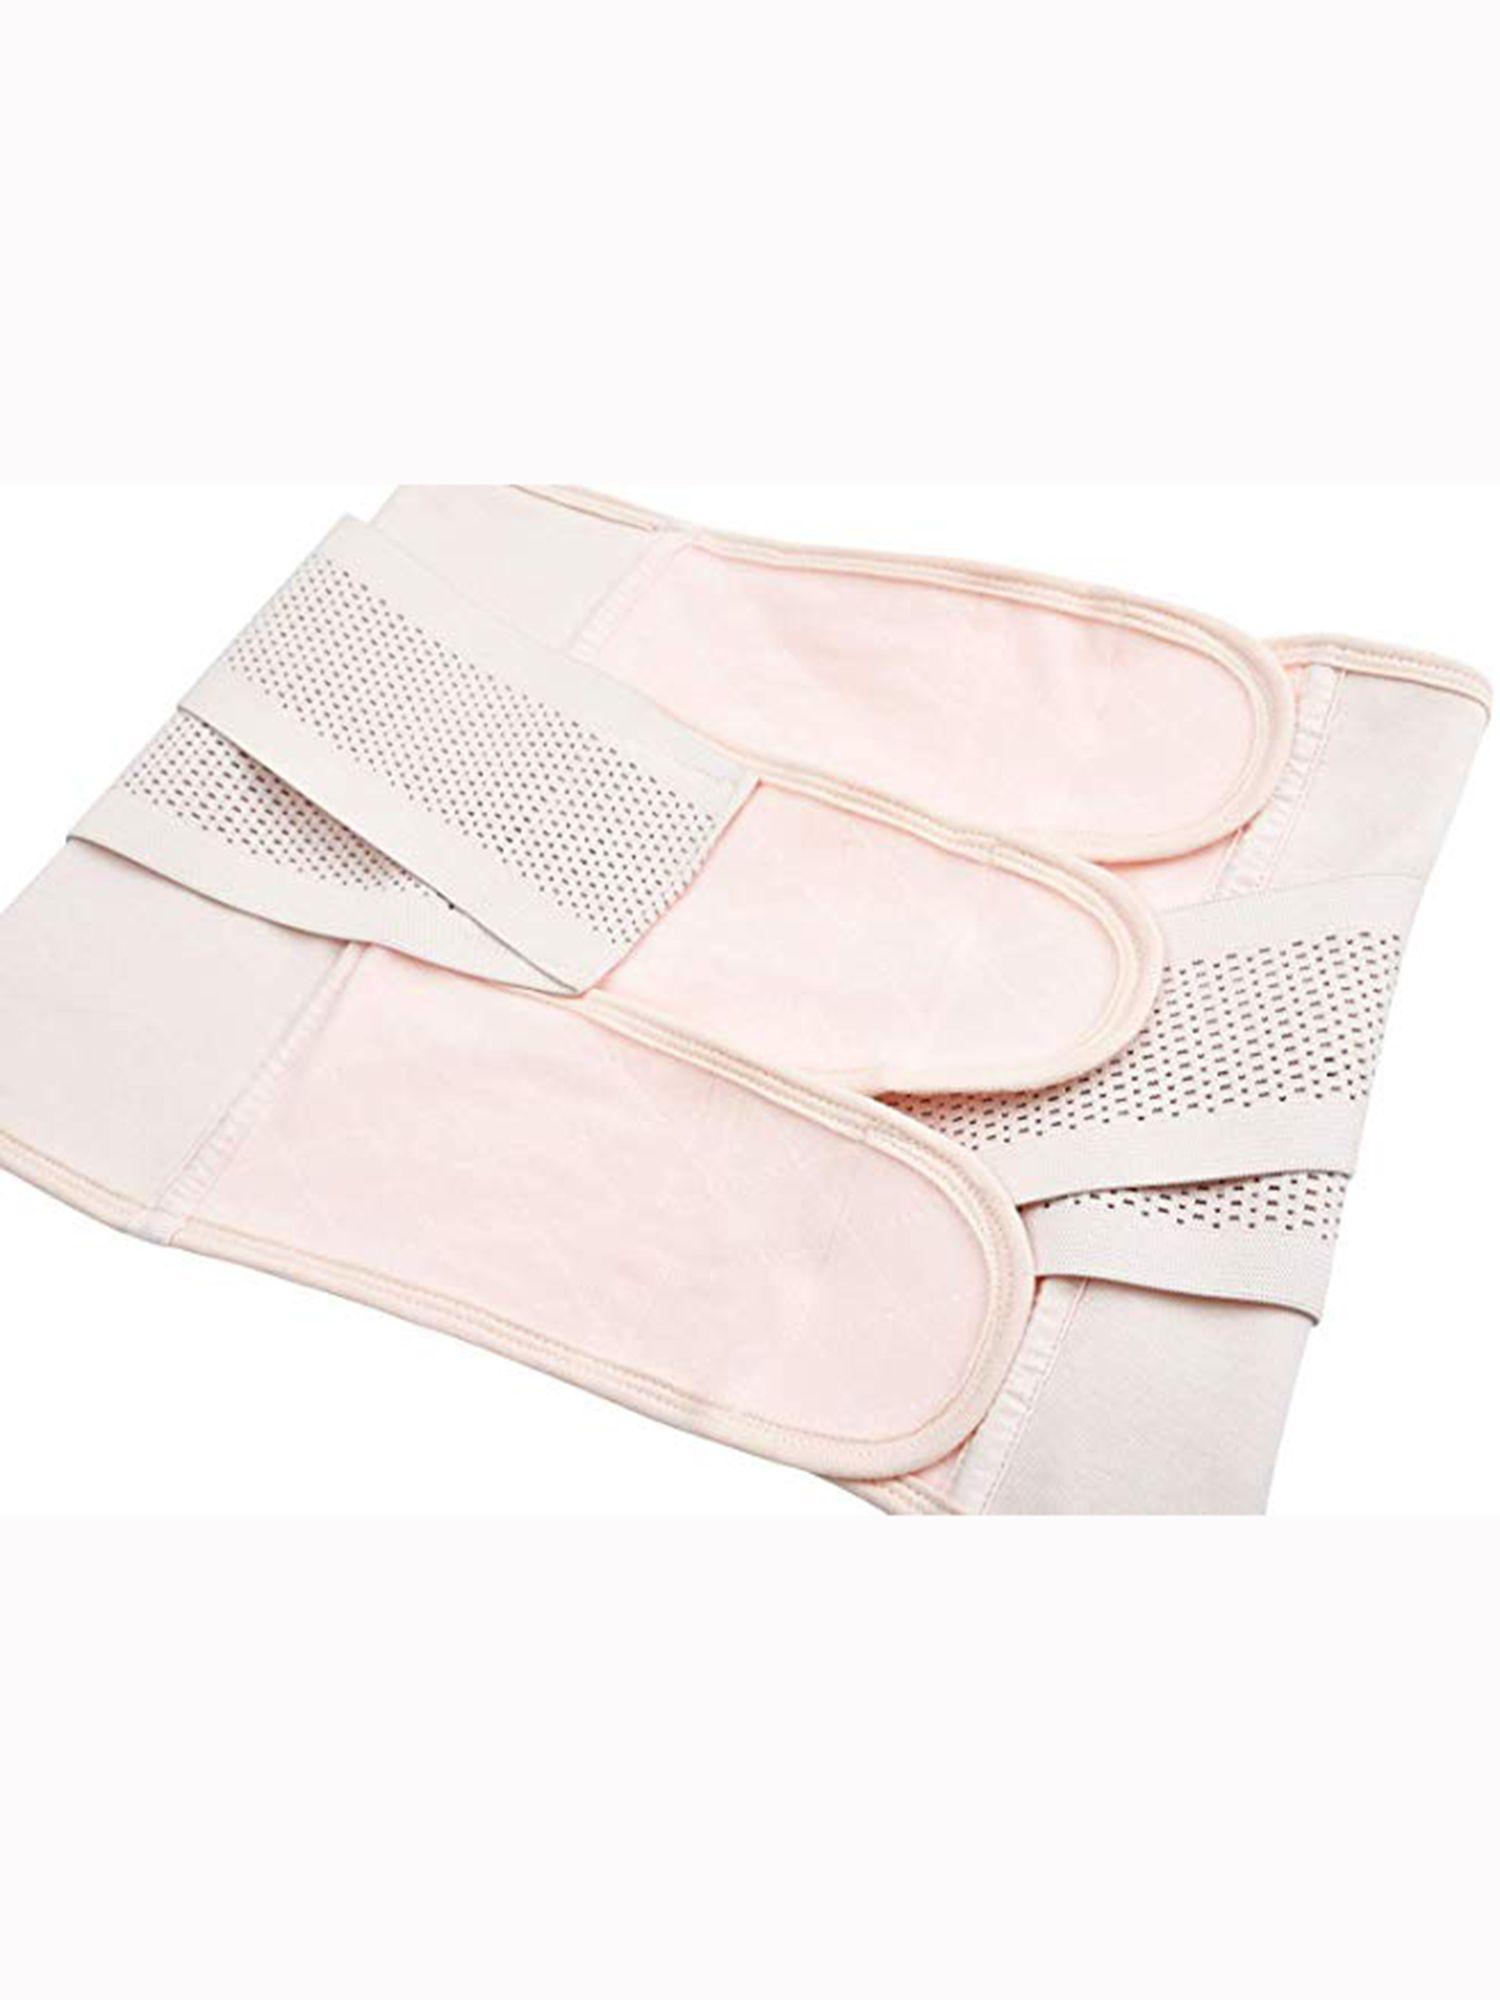 75ba5dc219 LELINTA Postpartum Girdle C-Section Recovery Belt Back Support Belly Wrap  Belly Band Shapewear